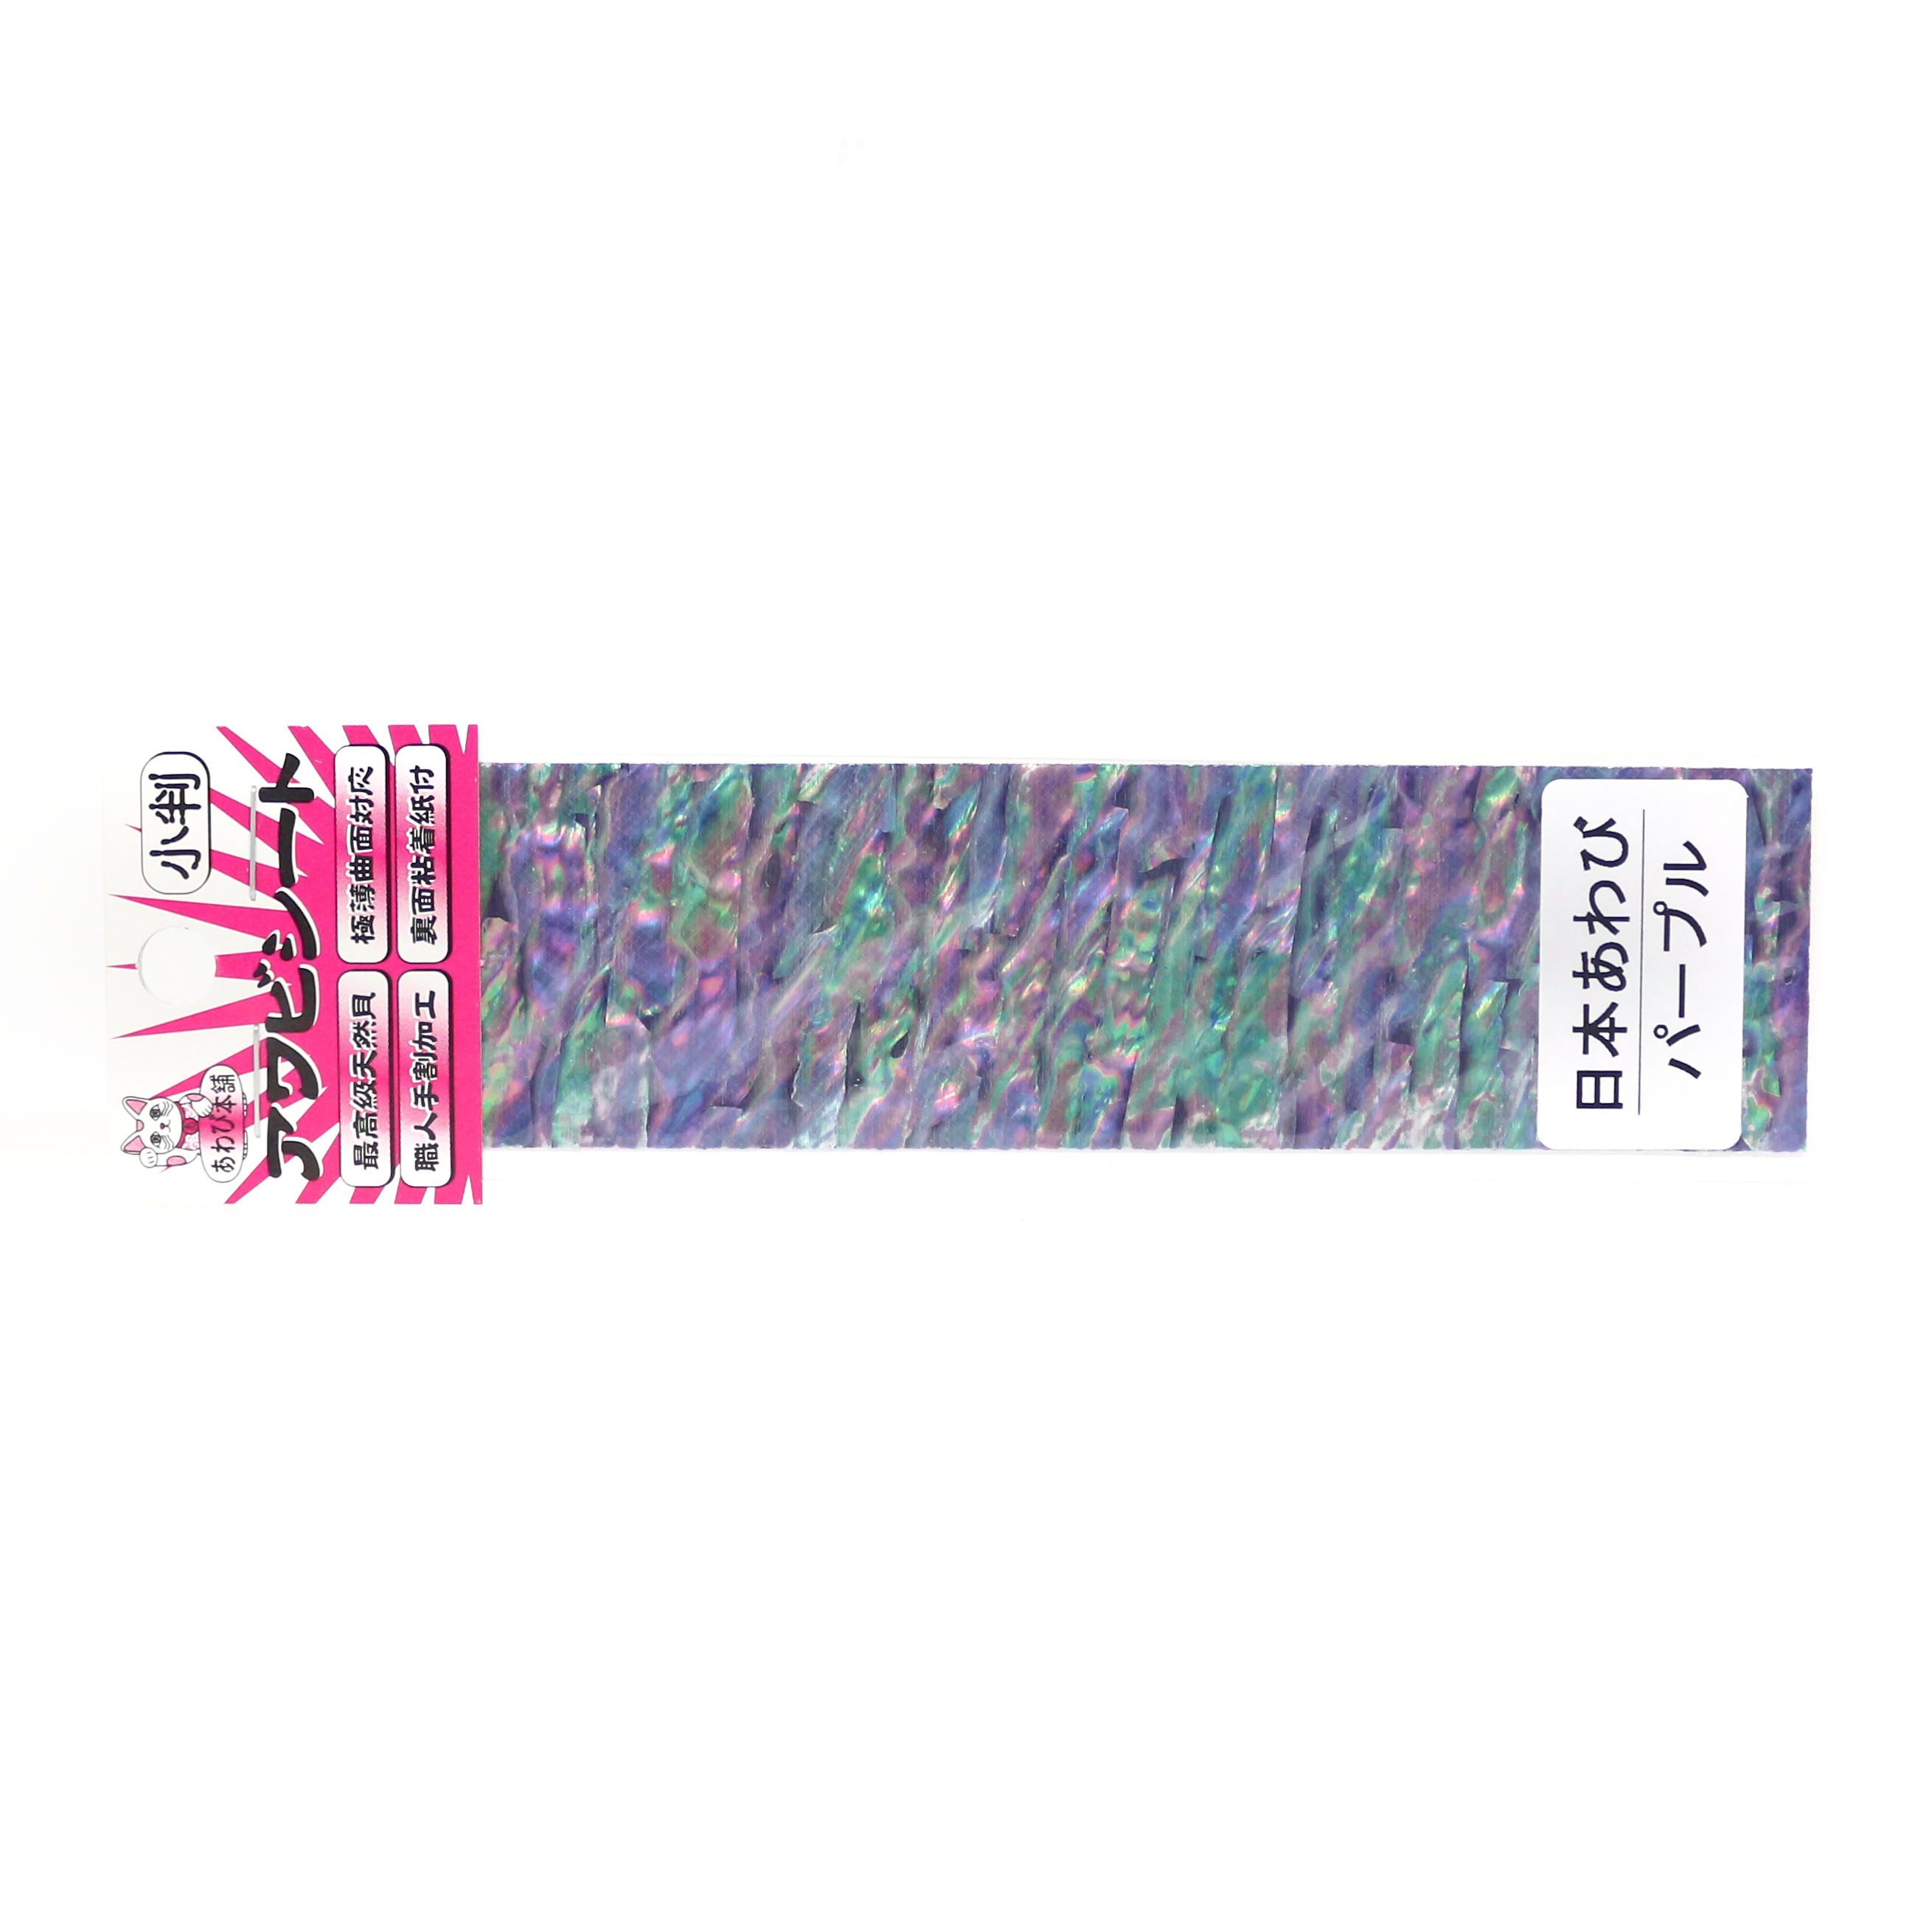 Awabi Honpo Awabi Sheet Japan Size S 40 x 140 mm Purple (0569)